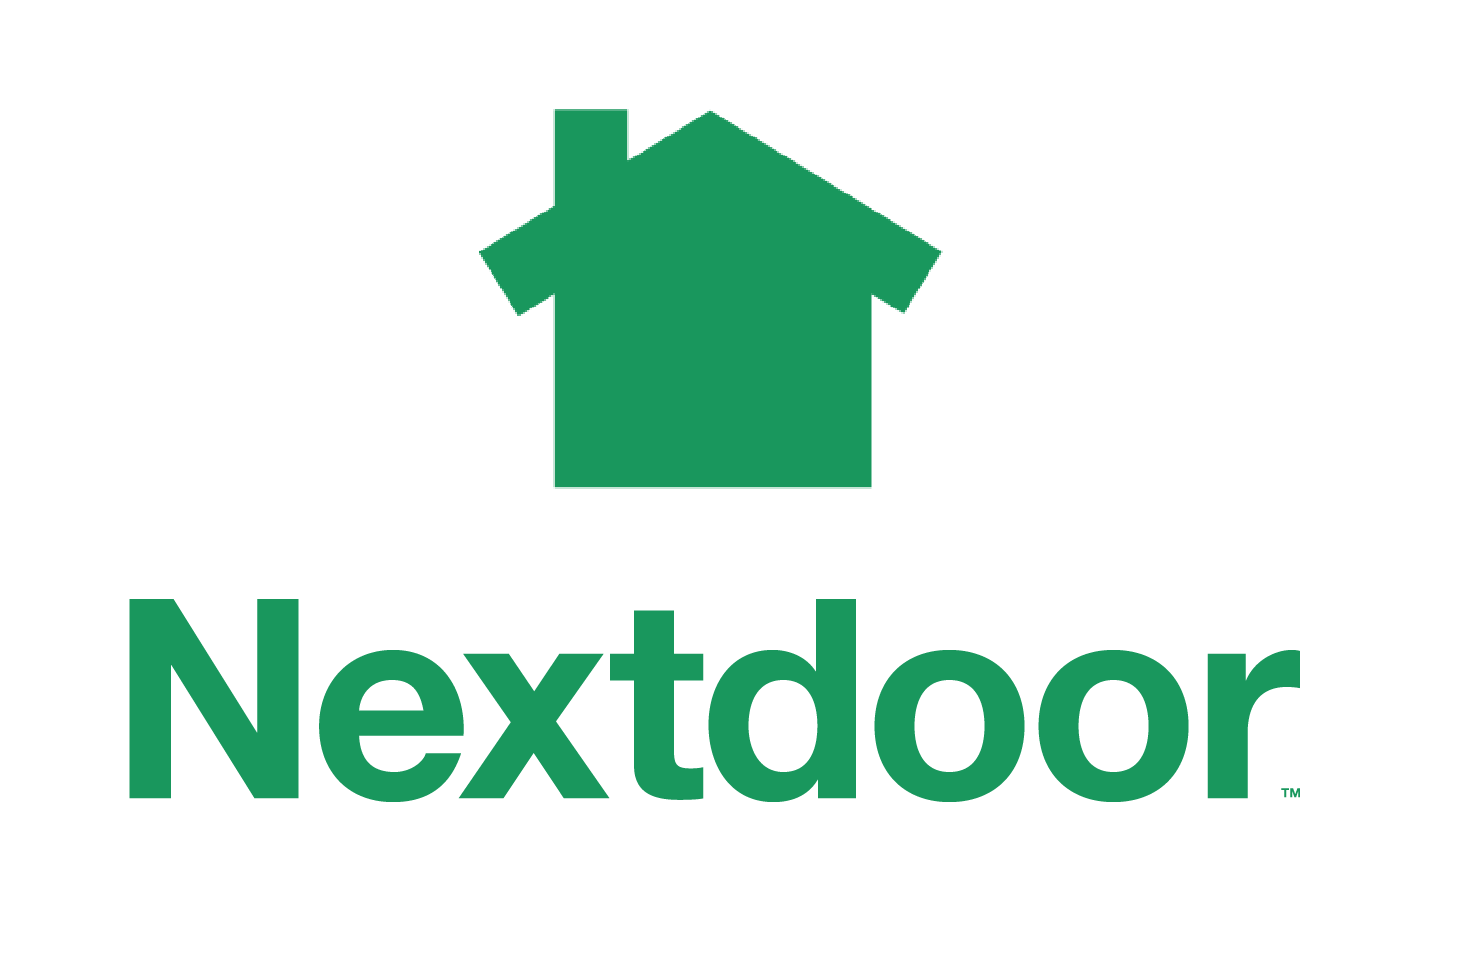 NextdoorLogo